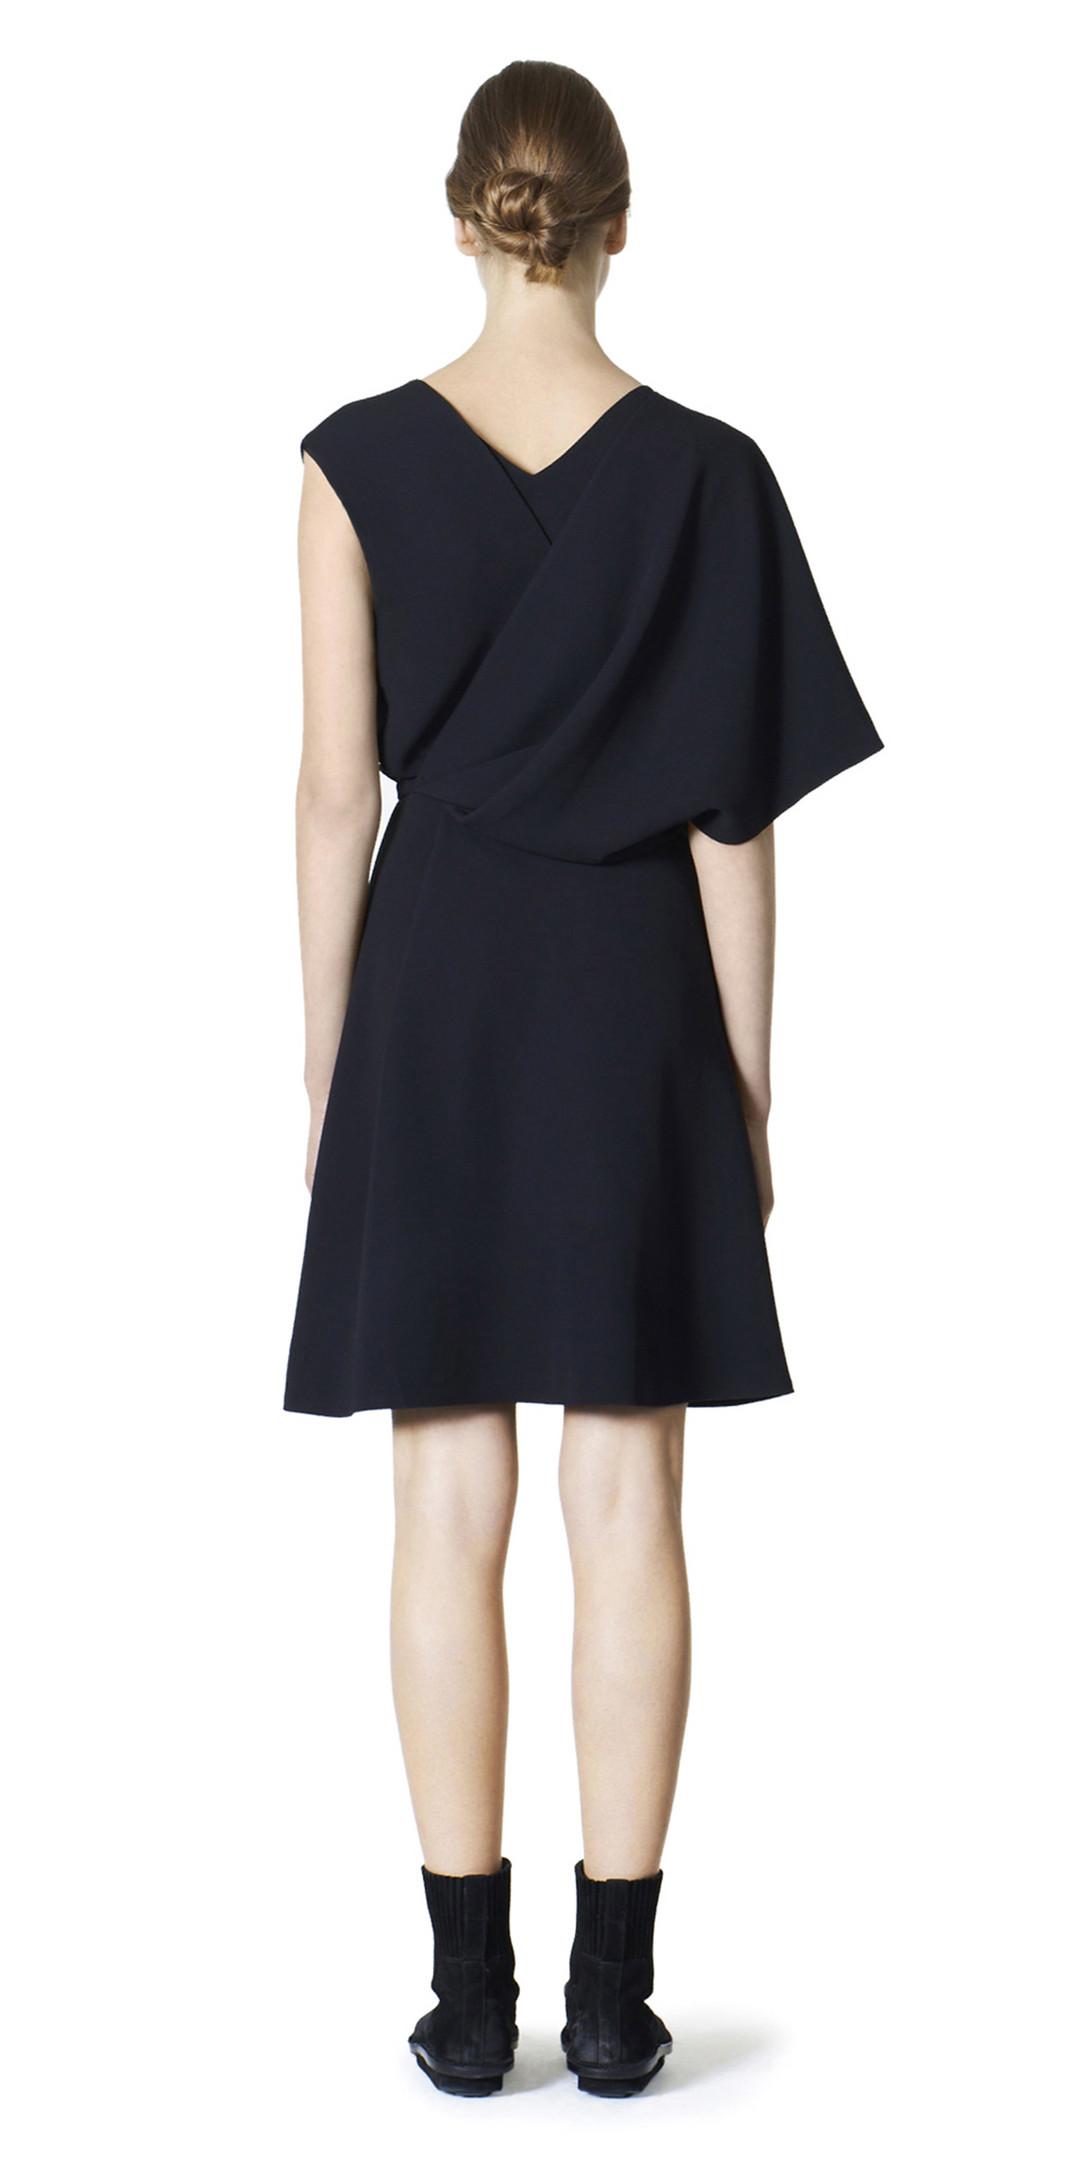 BALENCIAGA Dress D Balenciaga Carabiner Dress i